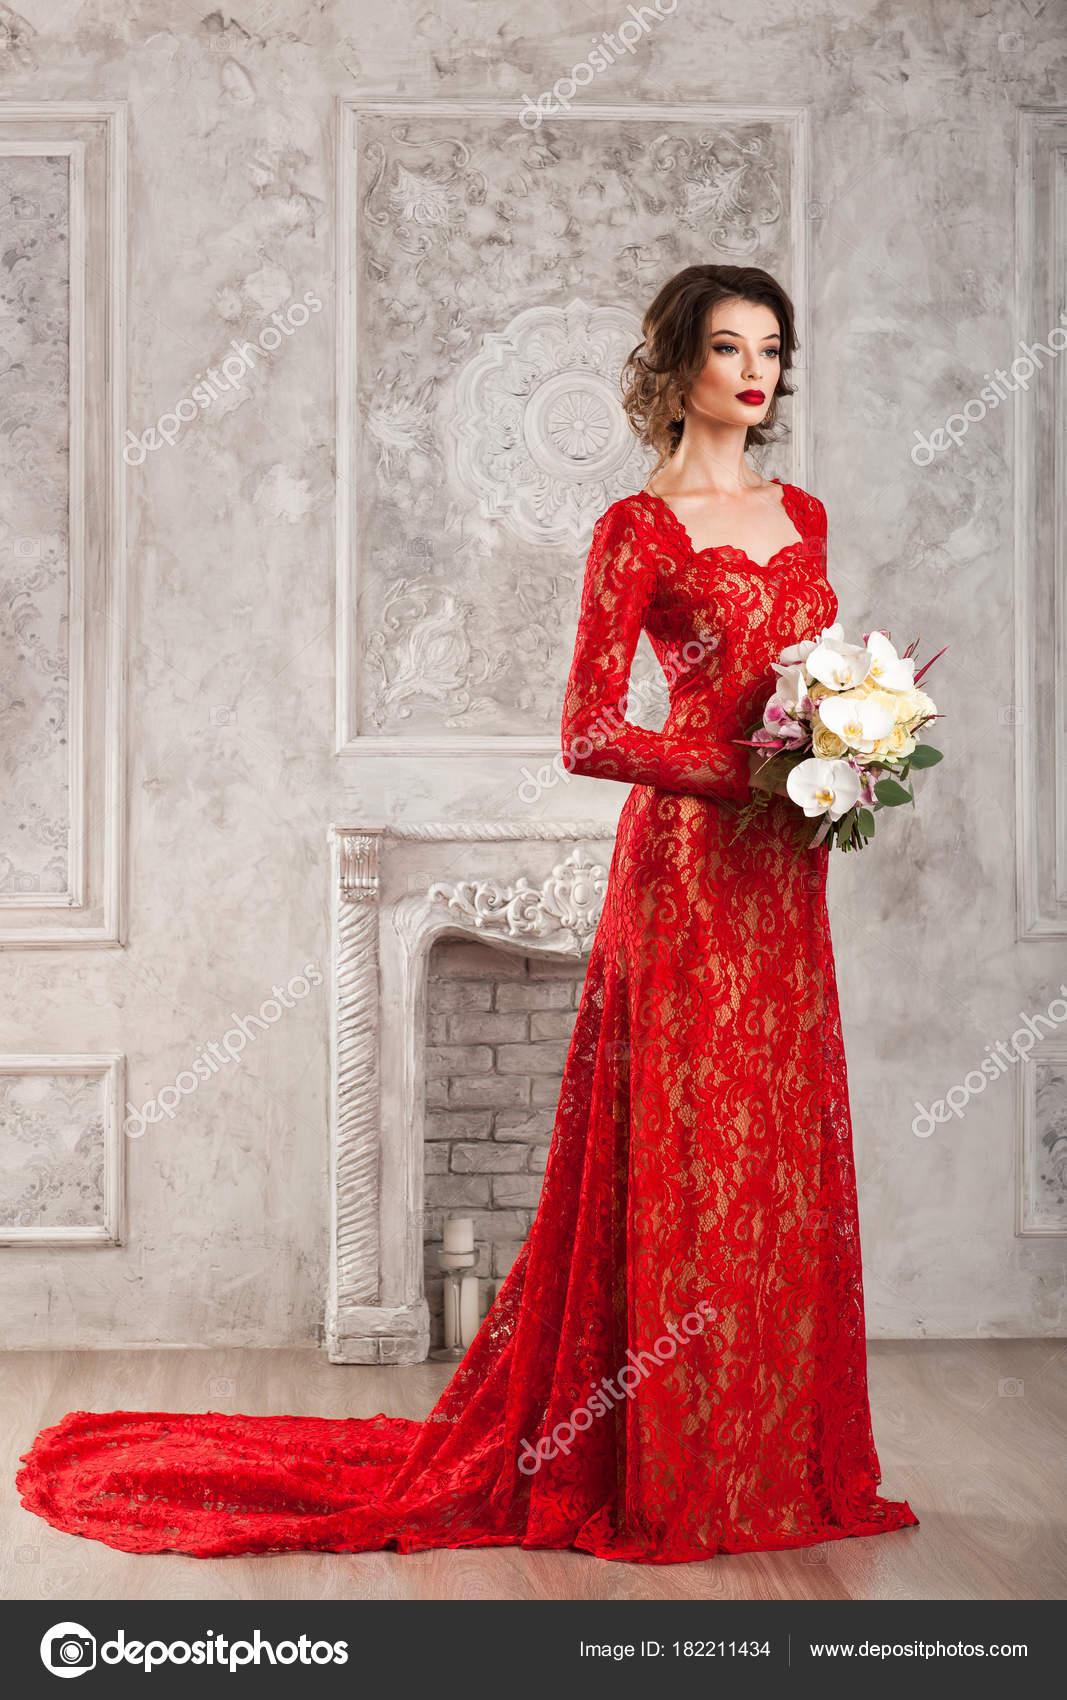 Hermosa Mujer Joven Elegante Vestido Rojo Encaje Con Ramo